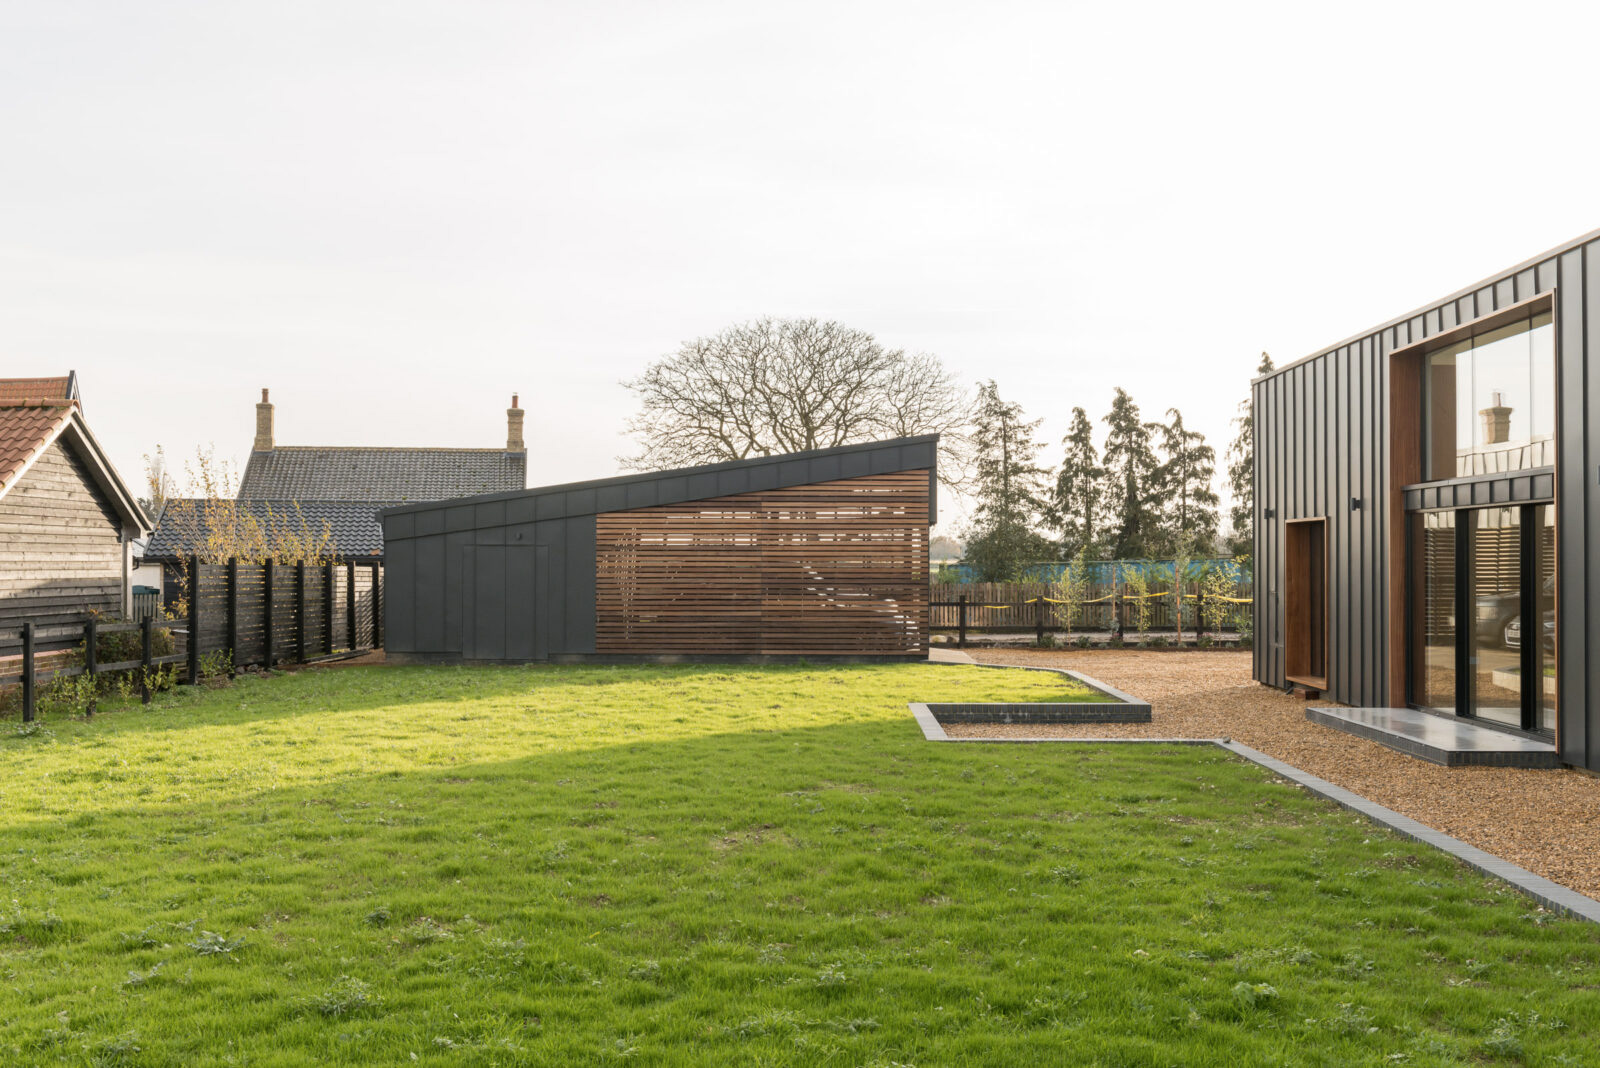 The Long Barn in Norfolk is designed by Studio Gray